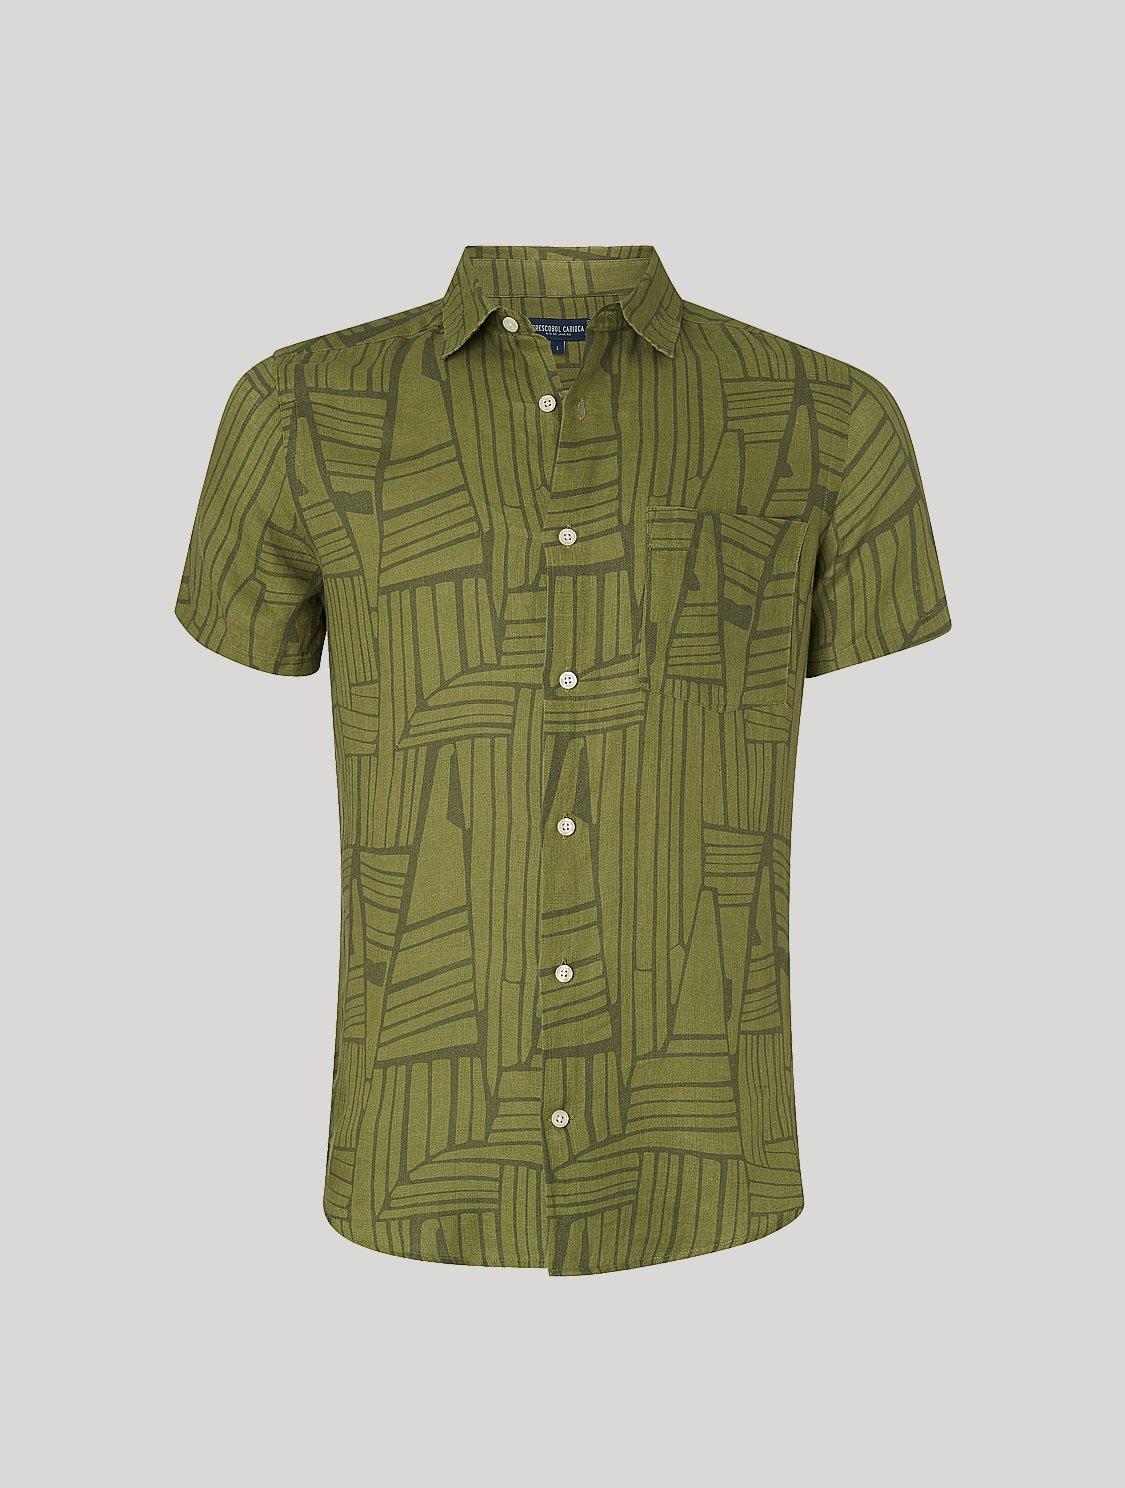 Tarsila Shirt Angles Print Olive L